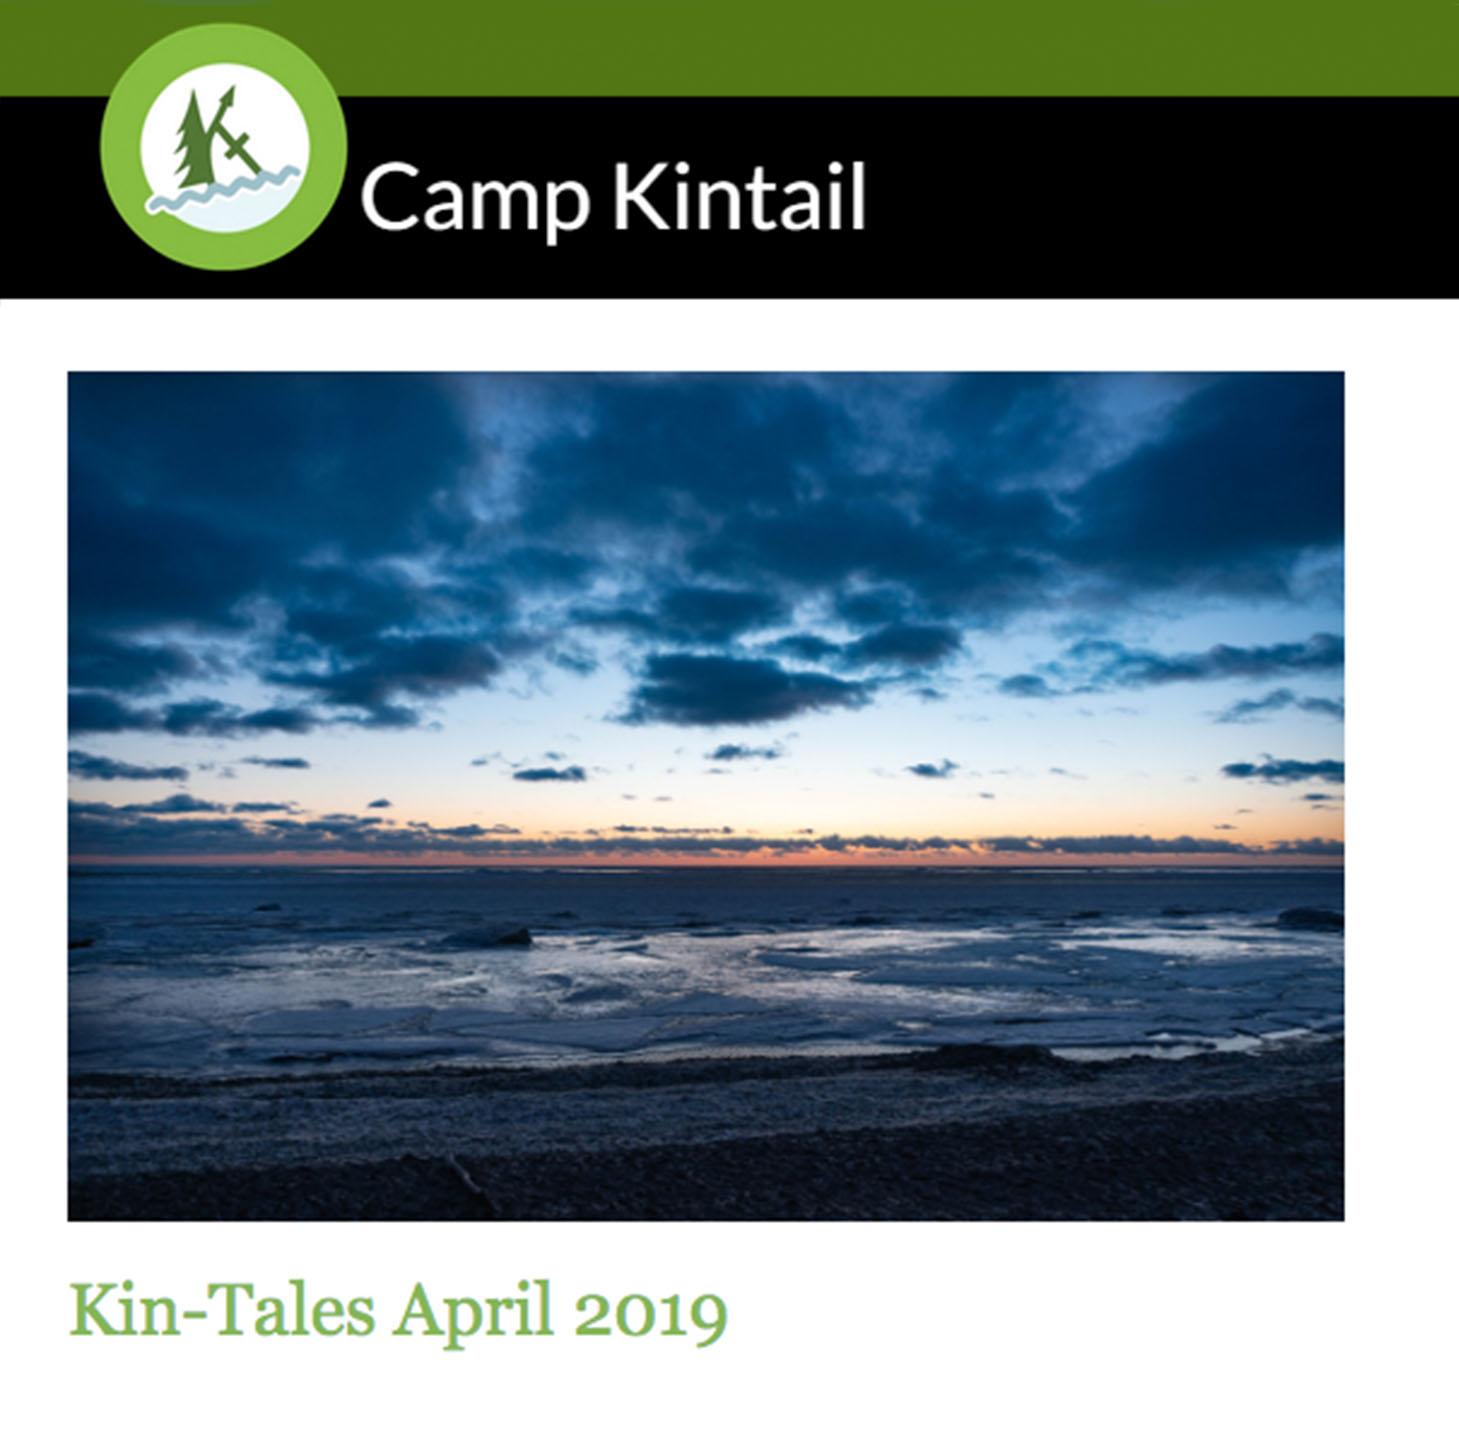 Title Text: Kin-Tales April 2019. Image: Cloudy Lake Huron sunset.